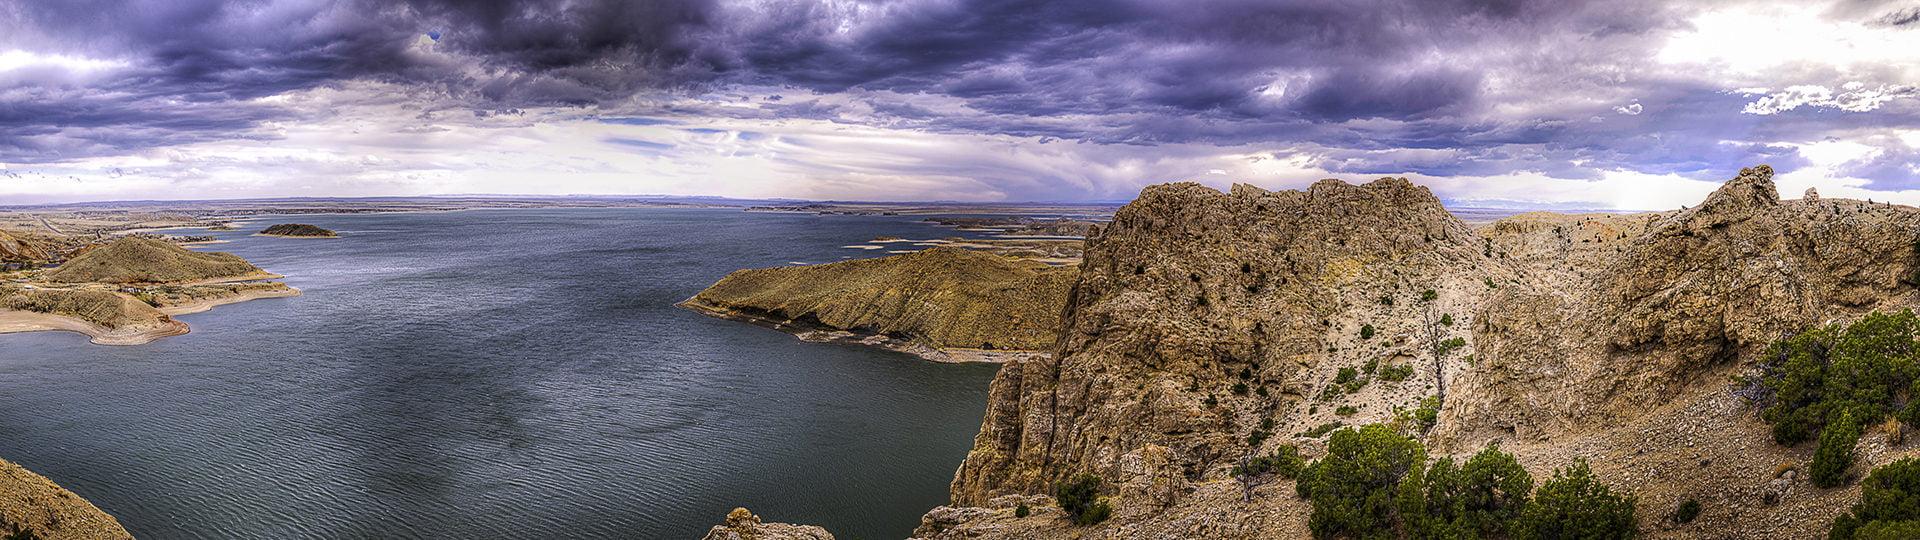 Boysen Reservoir